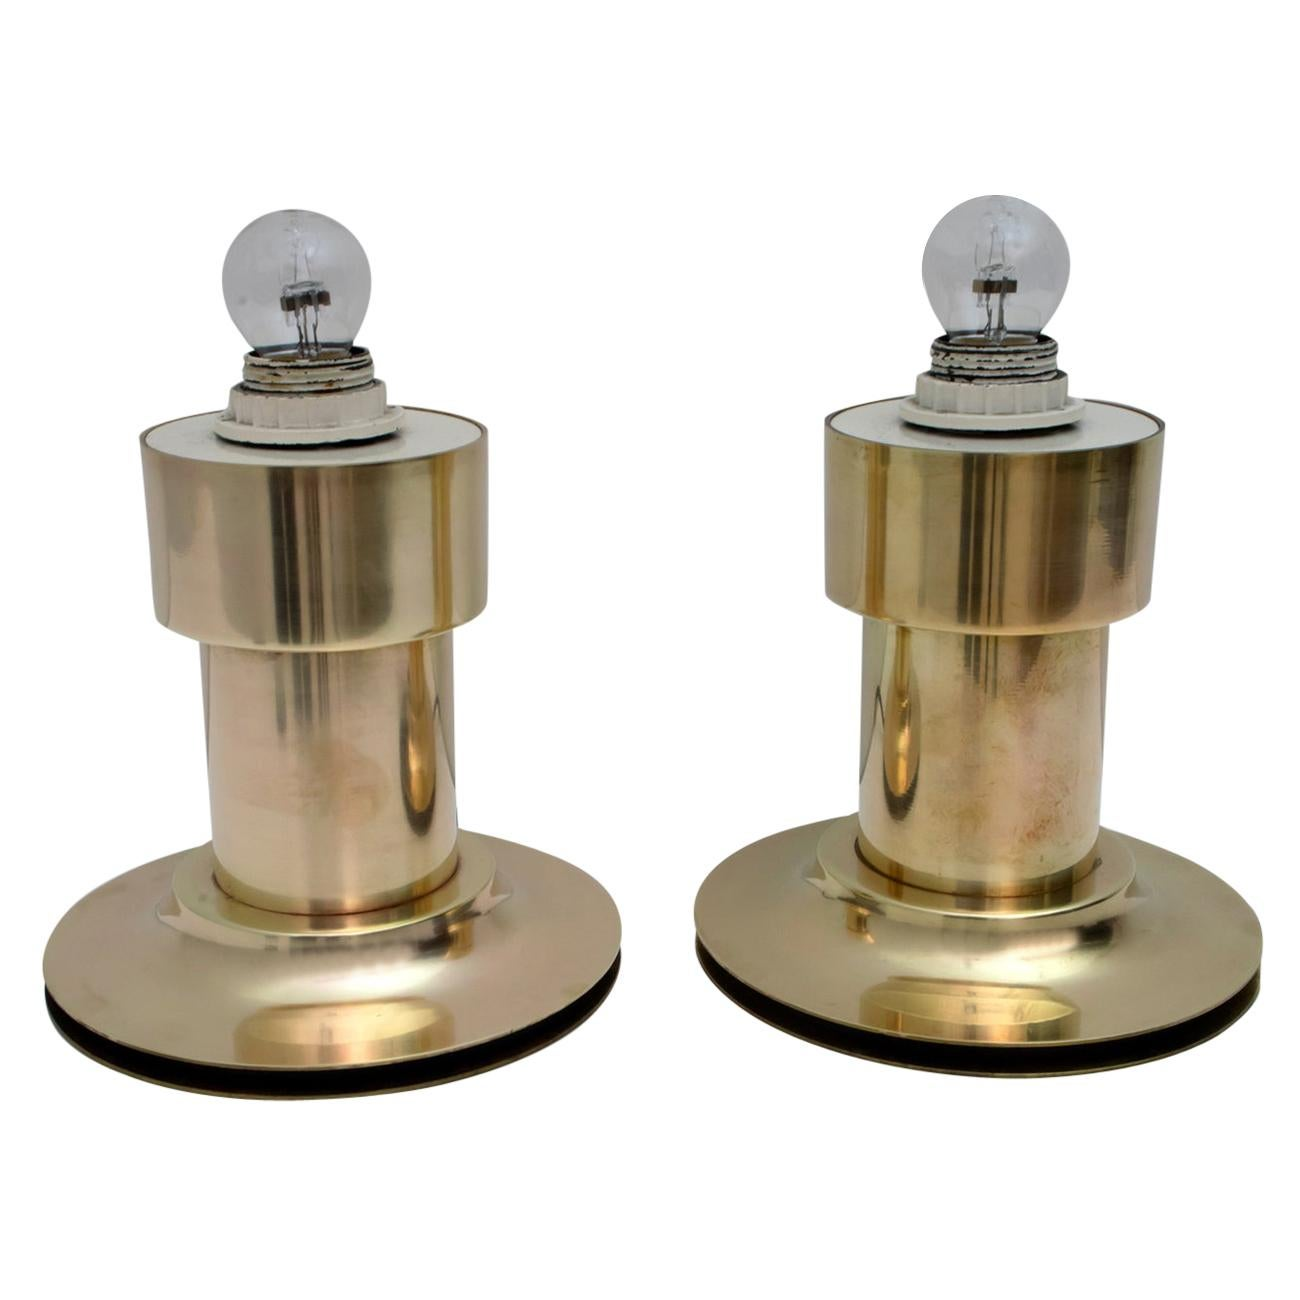 Pair of Mid-Century Modern Italian Brass Table Lamps, 1960s